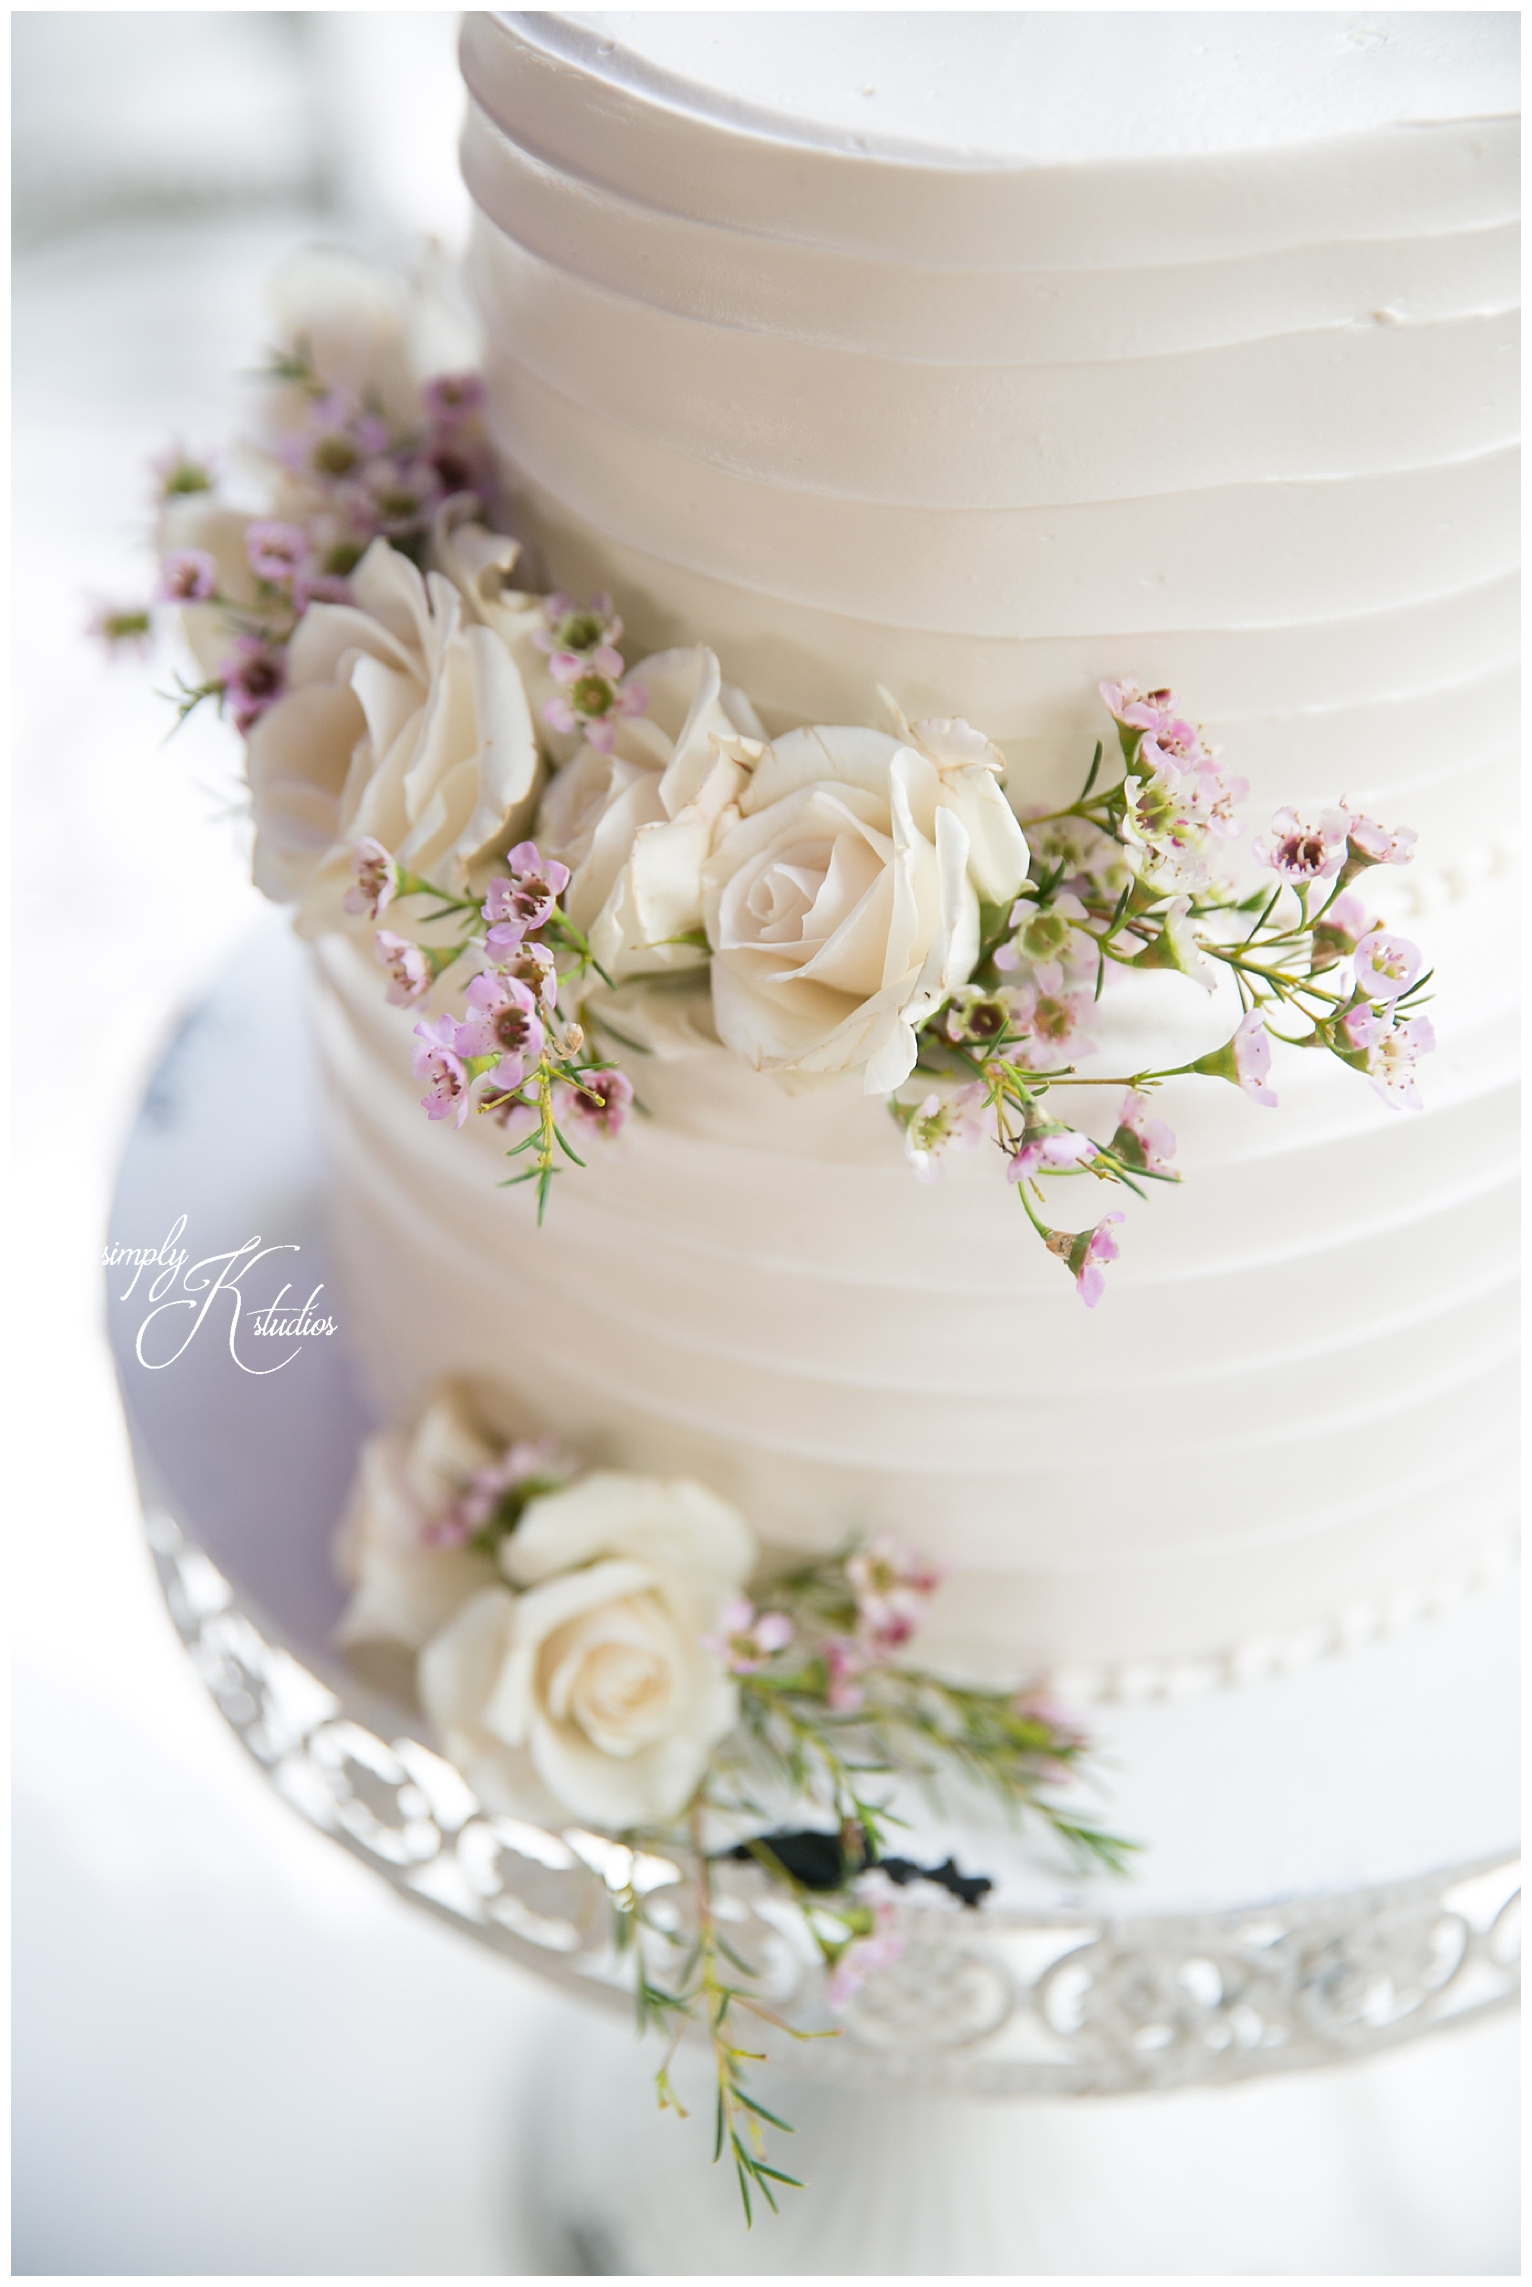 Flowers on a Wedding Cake.jpg